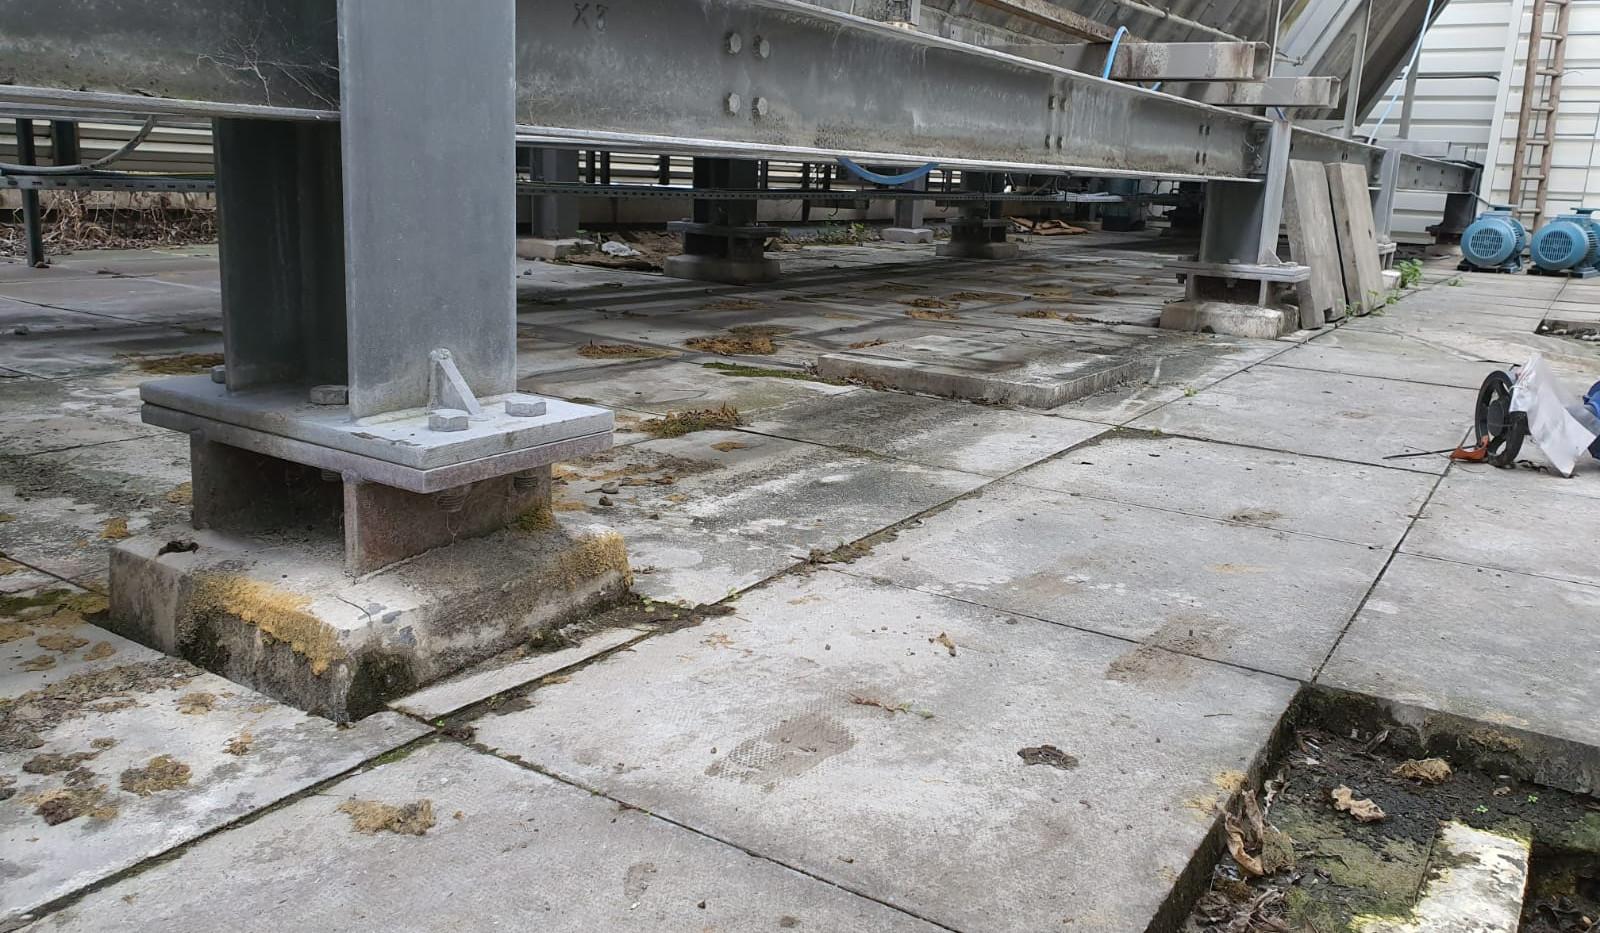 LeonardoRoyalHotel Roof Repair,Cold Melt, London